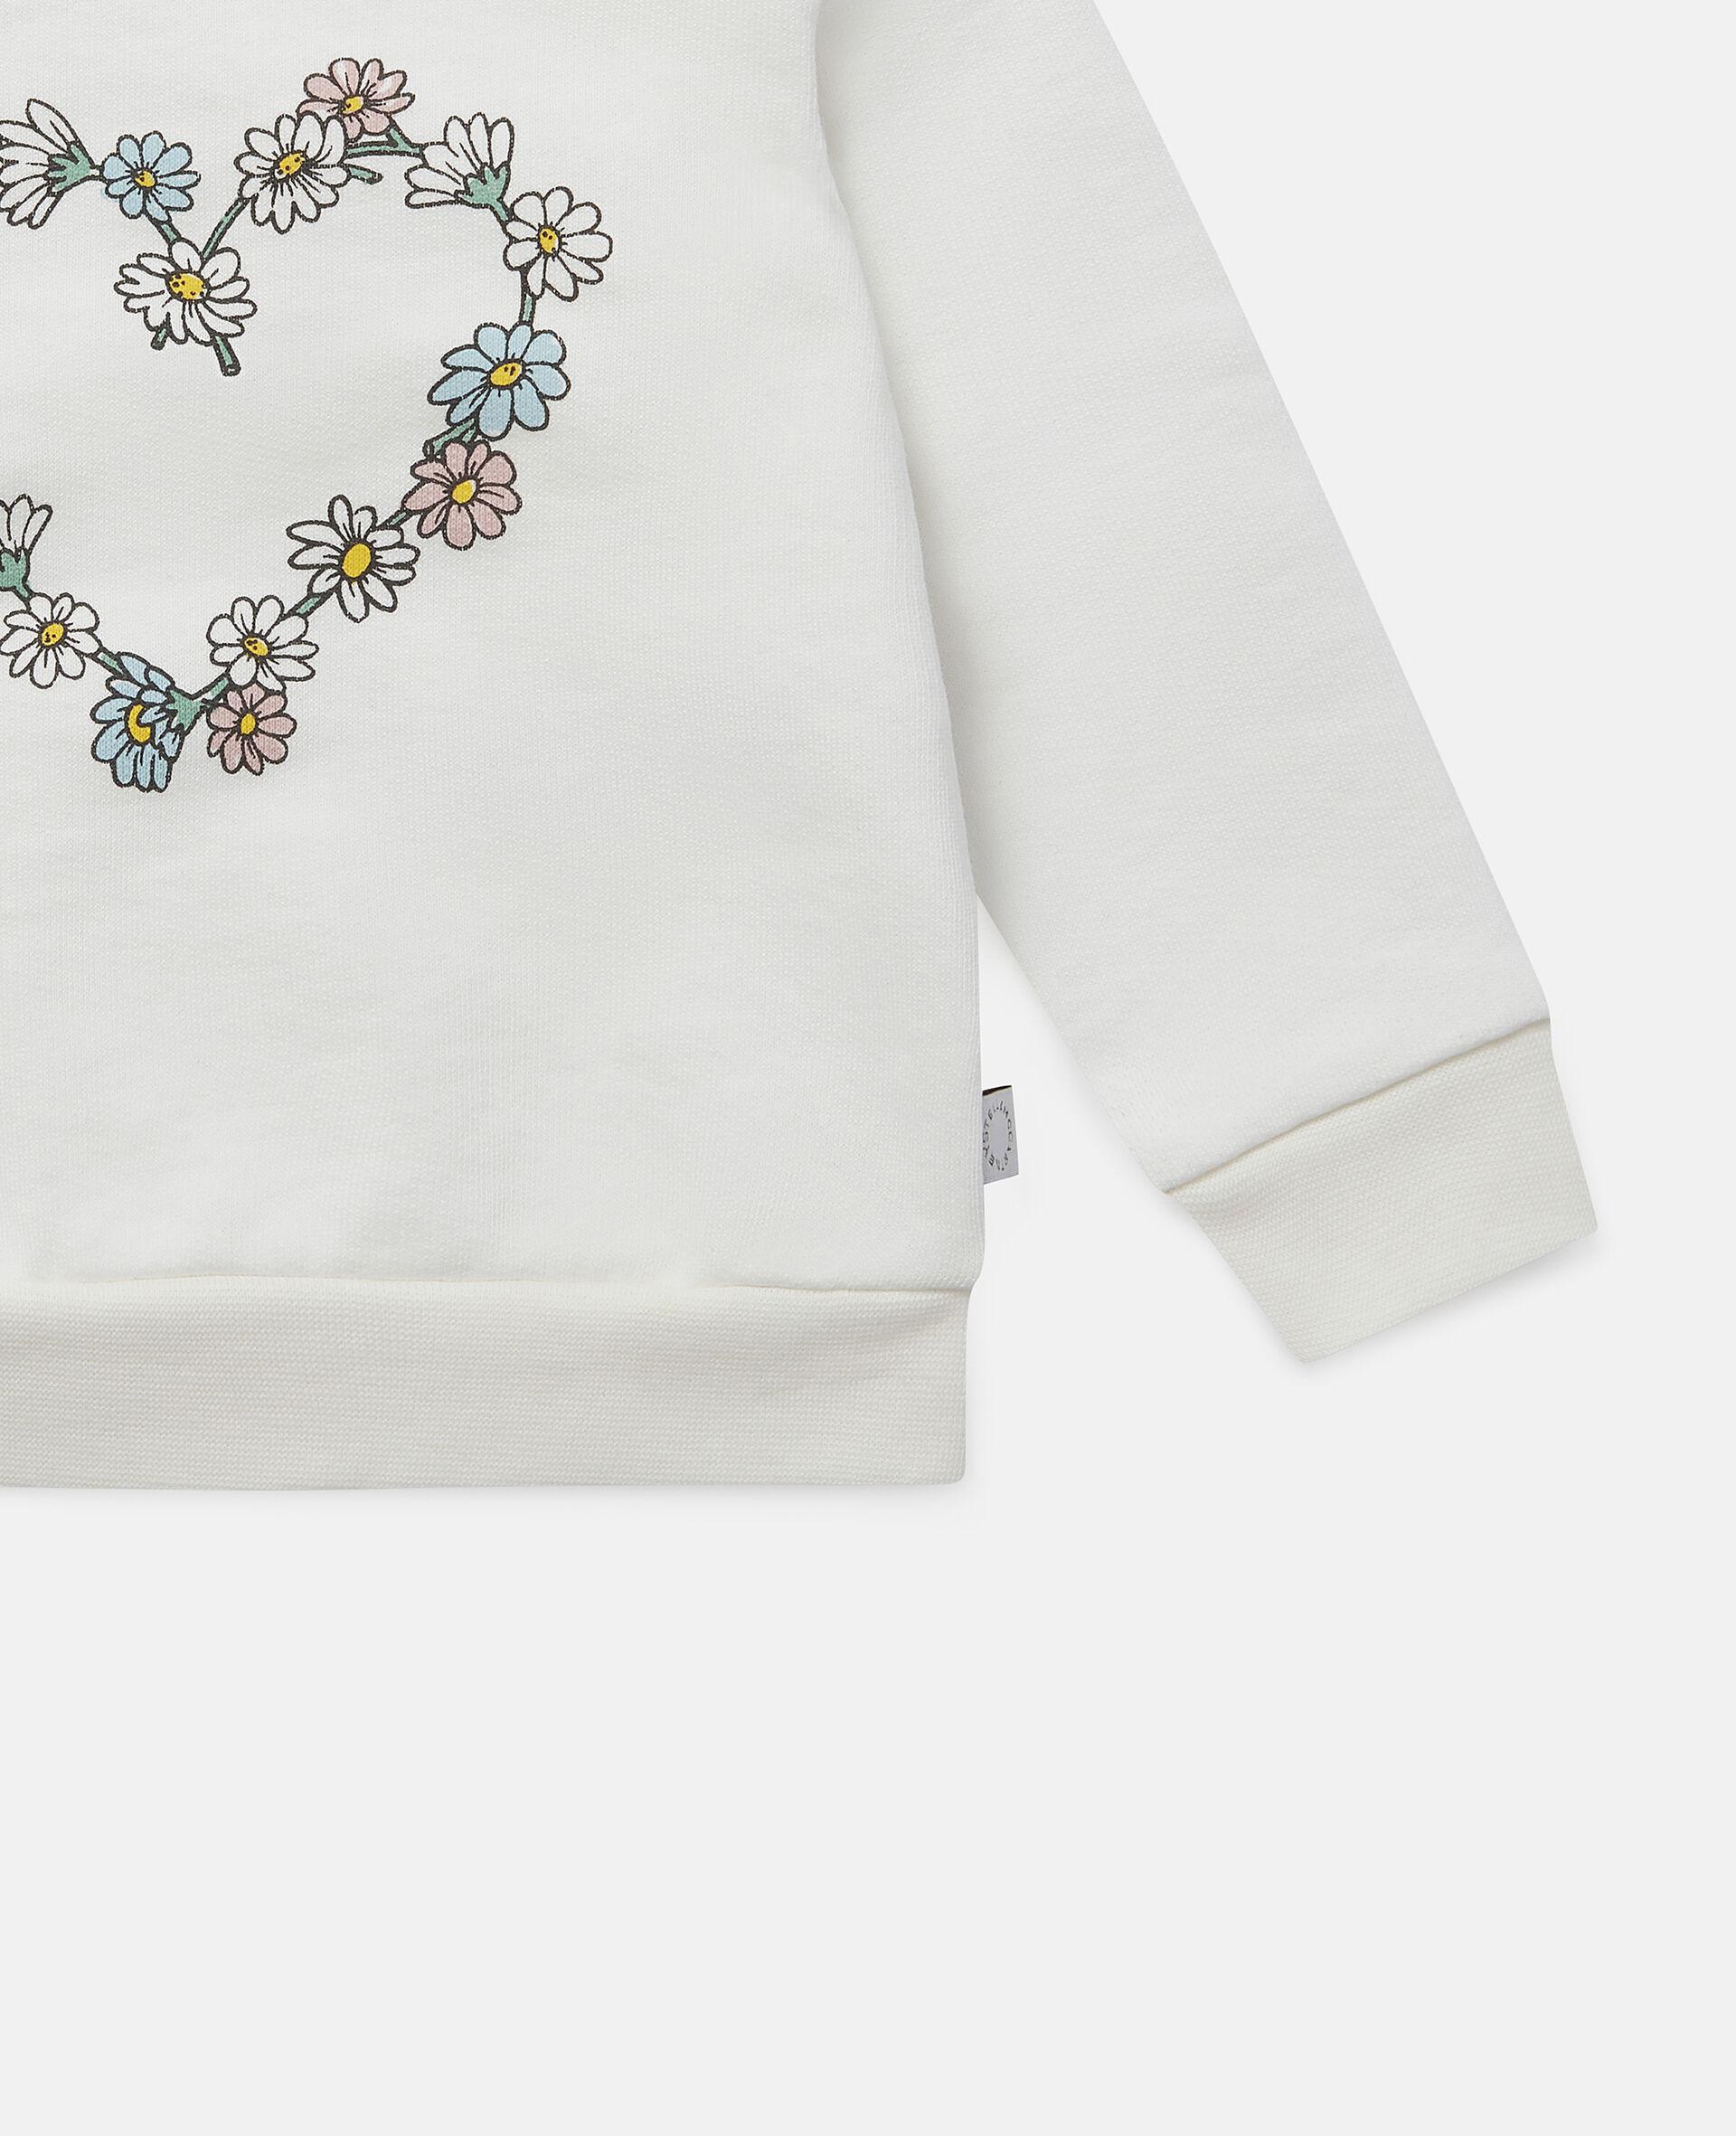 Daisy Heart Cotton Fleece Sweatshirt -White-large image number 2